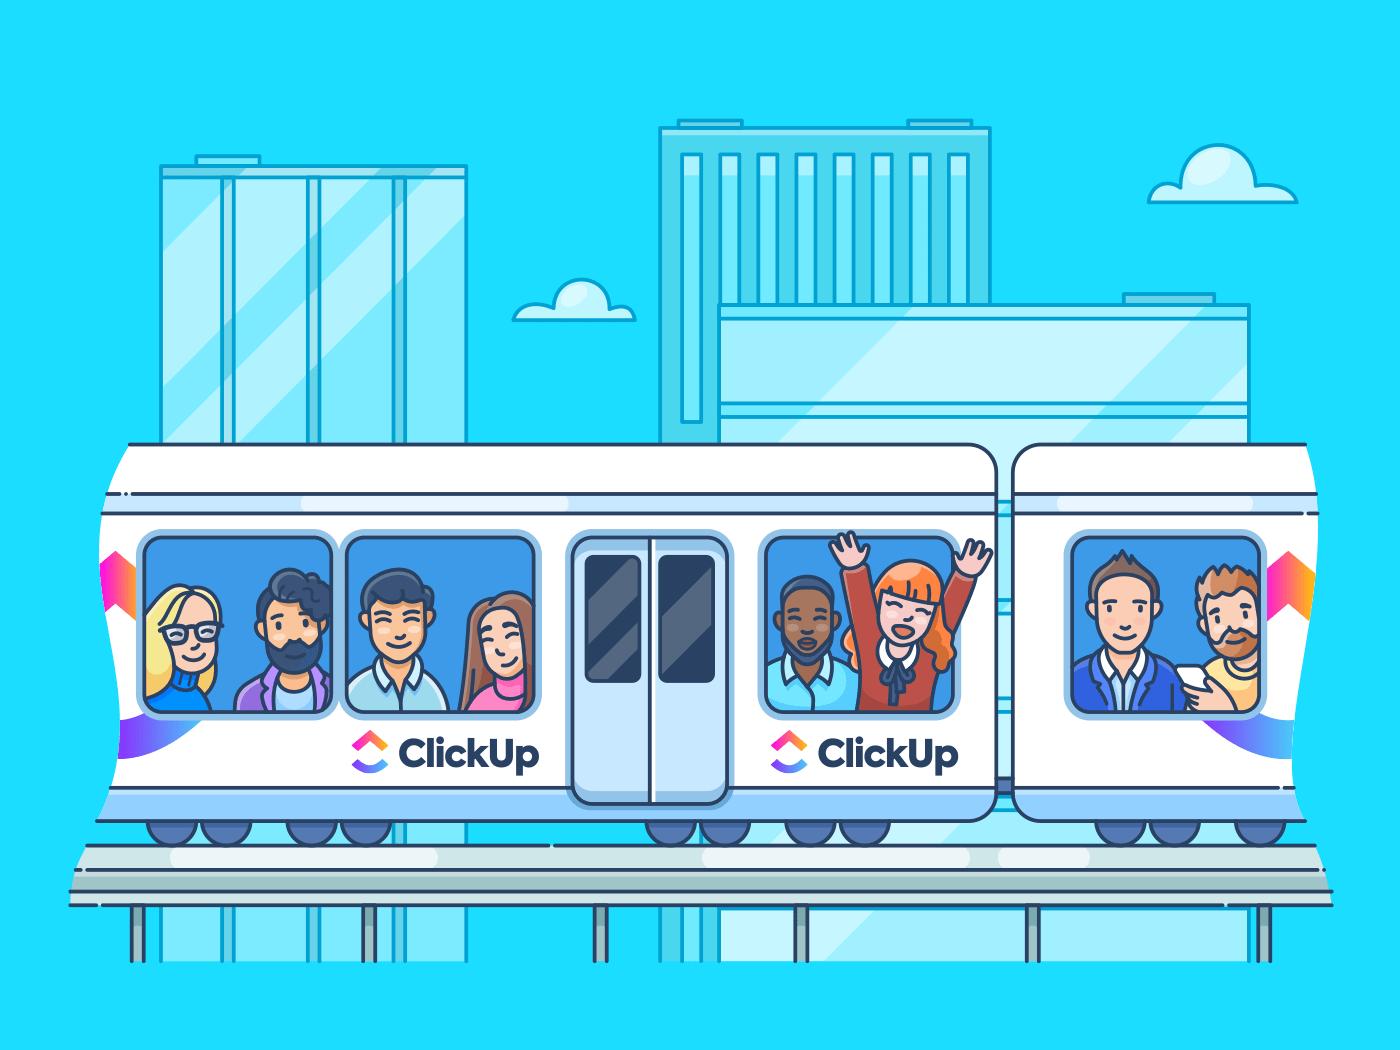 How ClickUp's Marketing Team Uses ClickUp